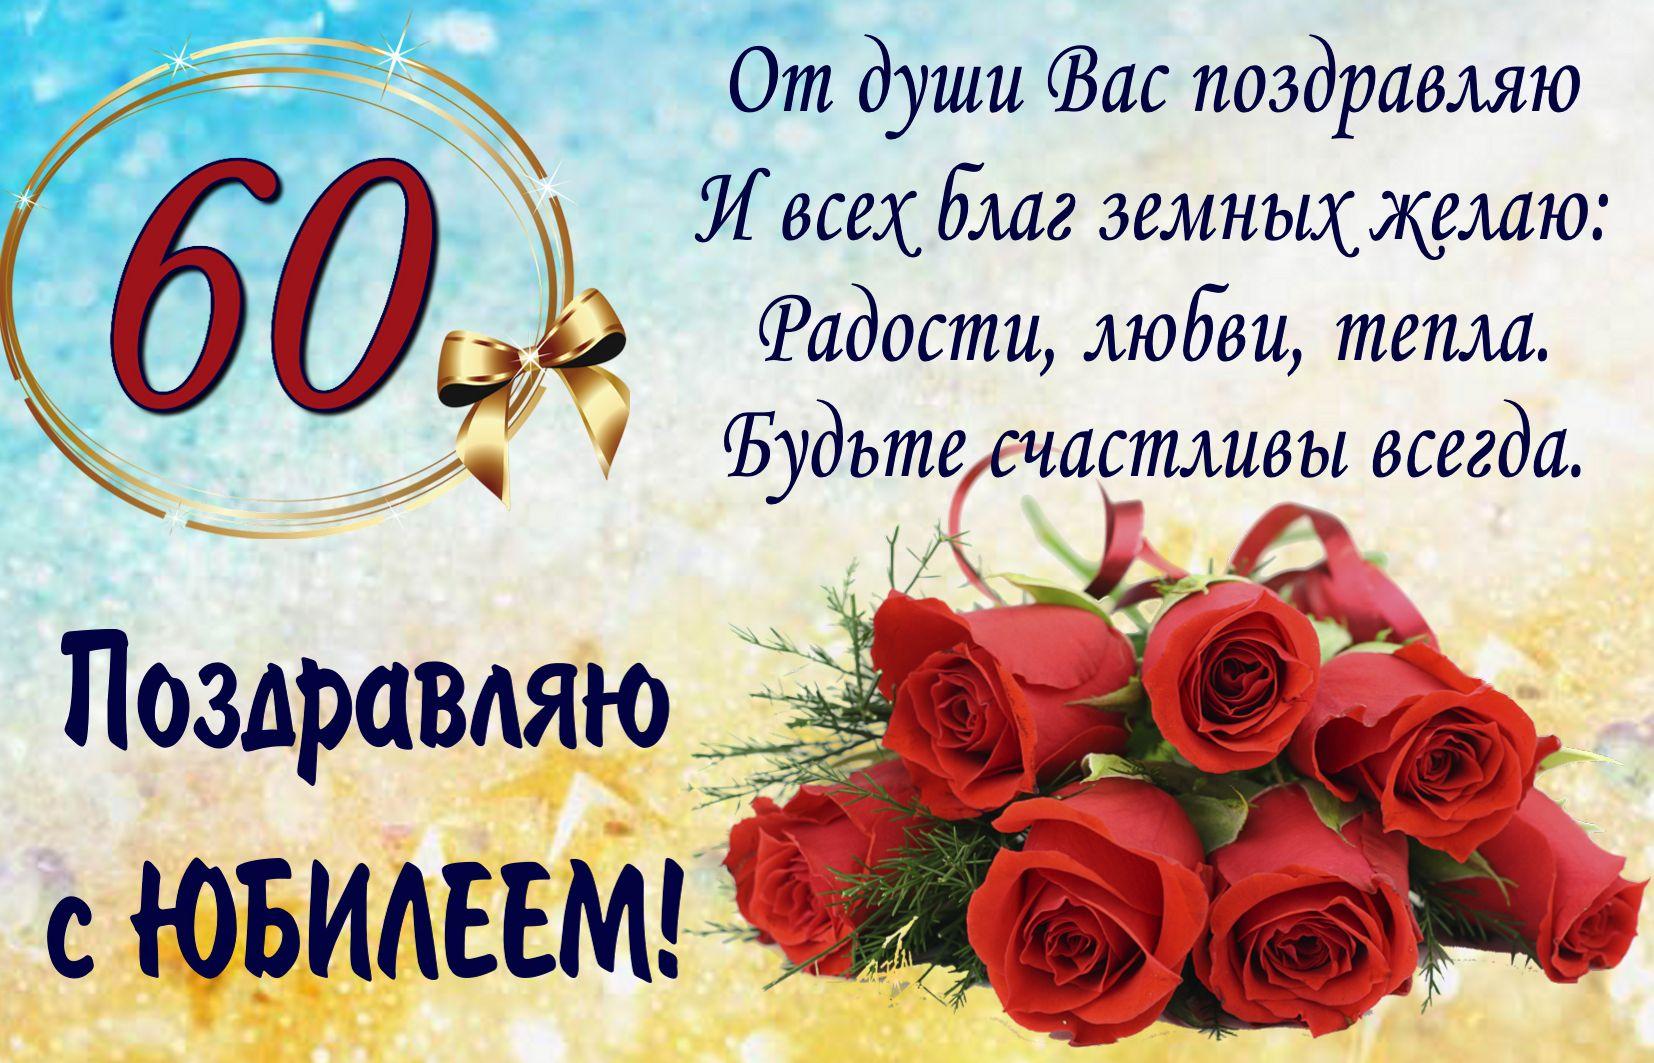 Поздравления л юбилею